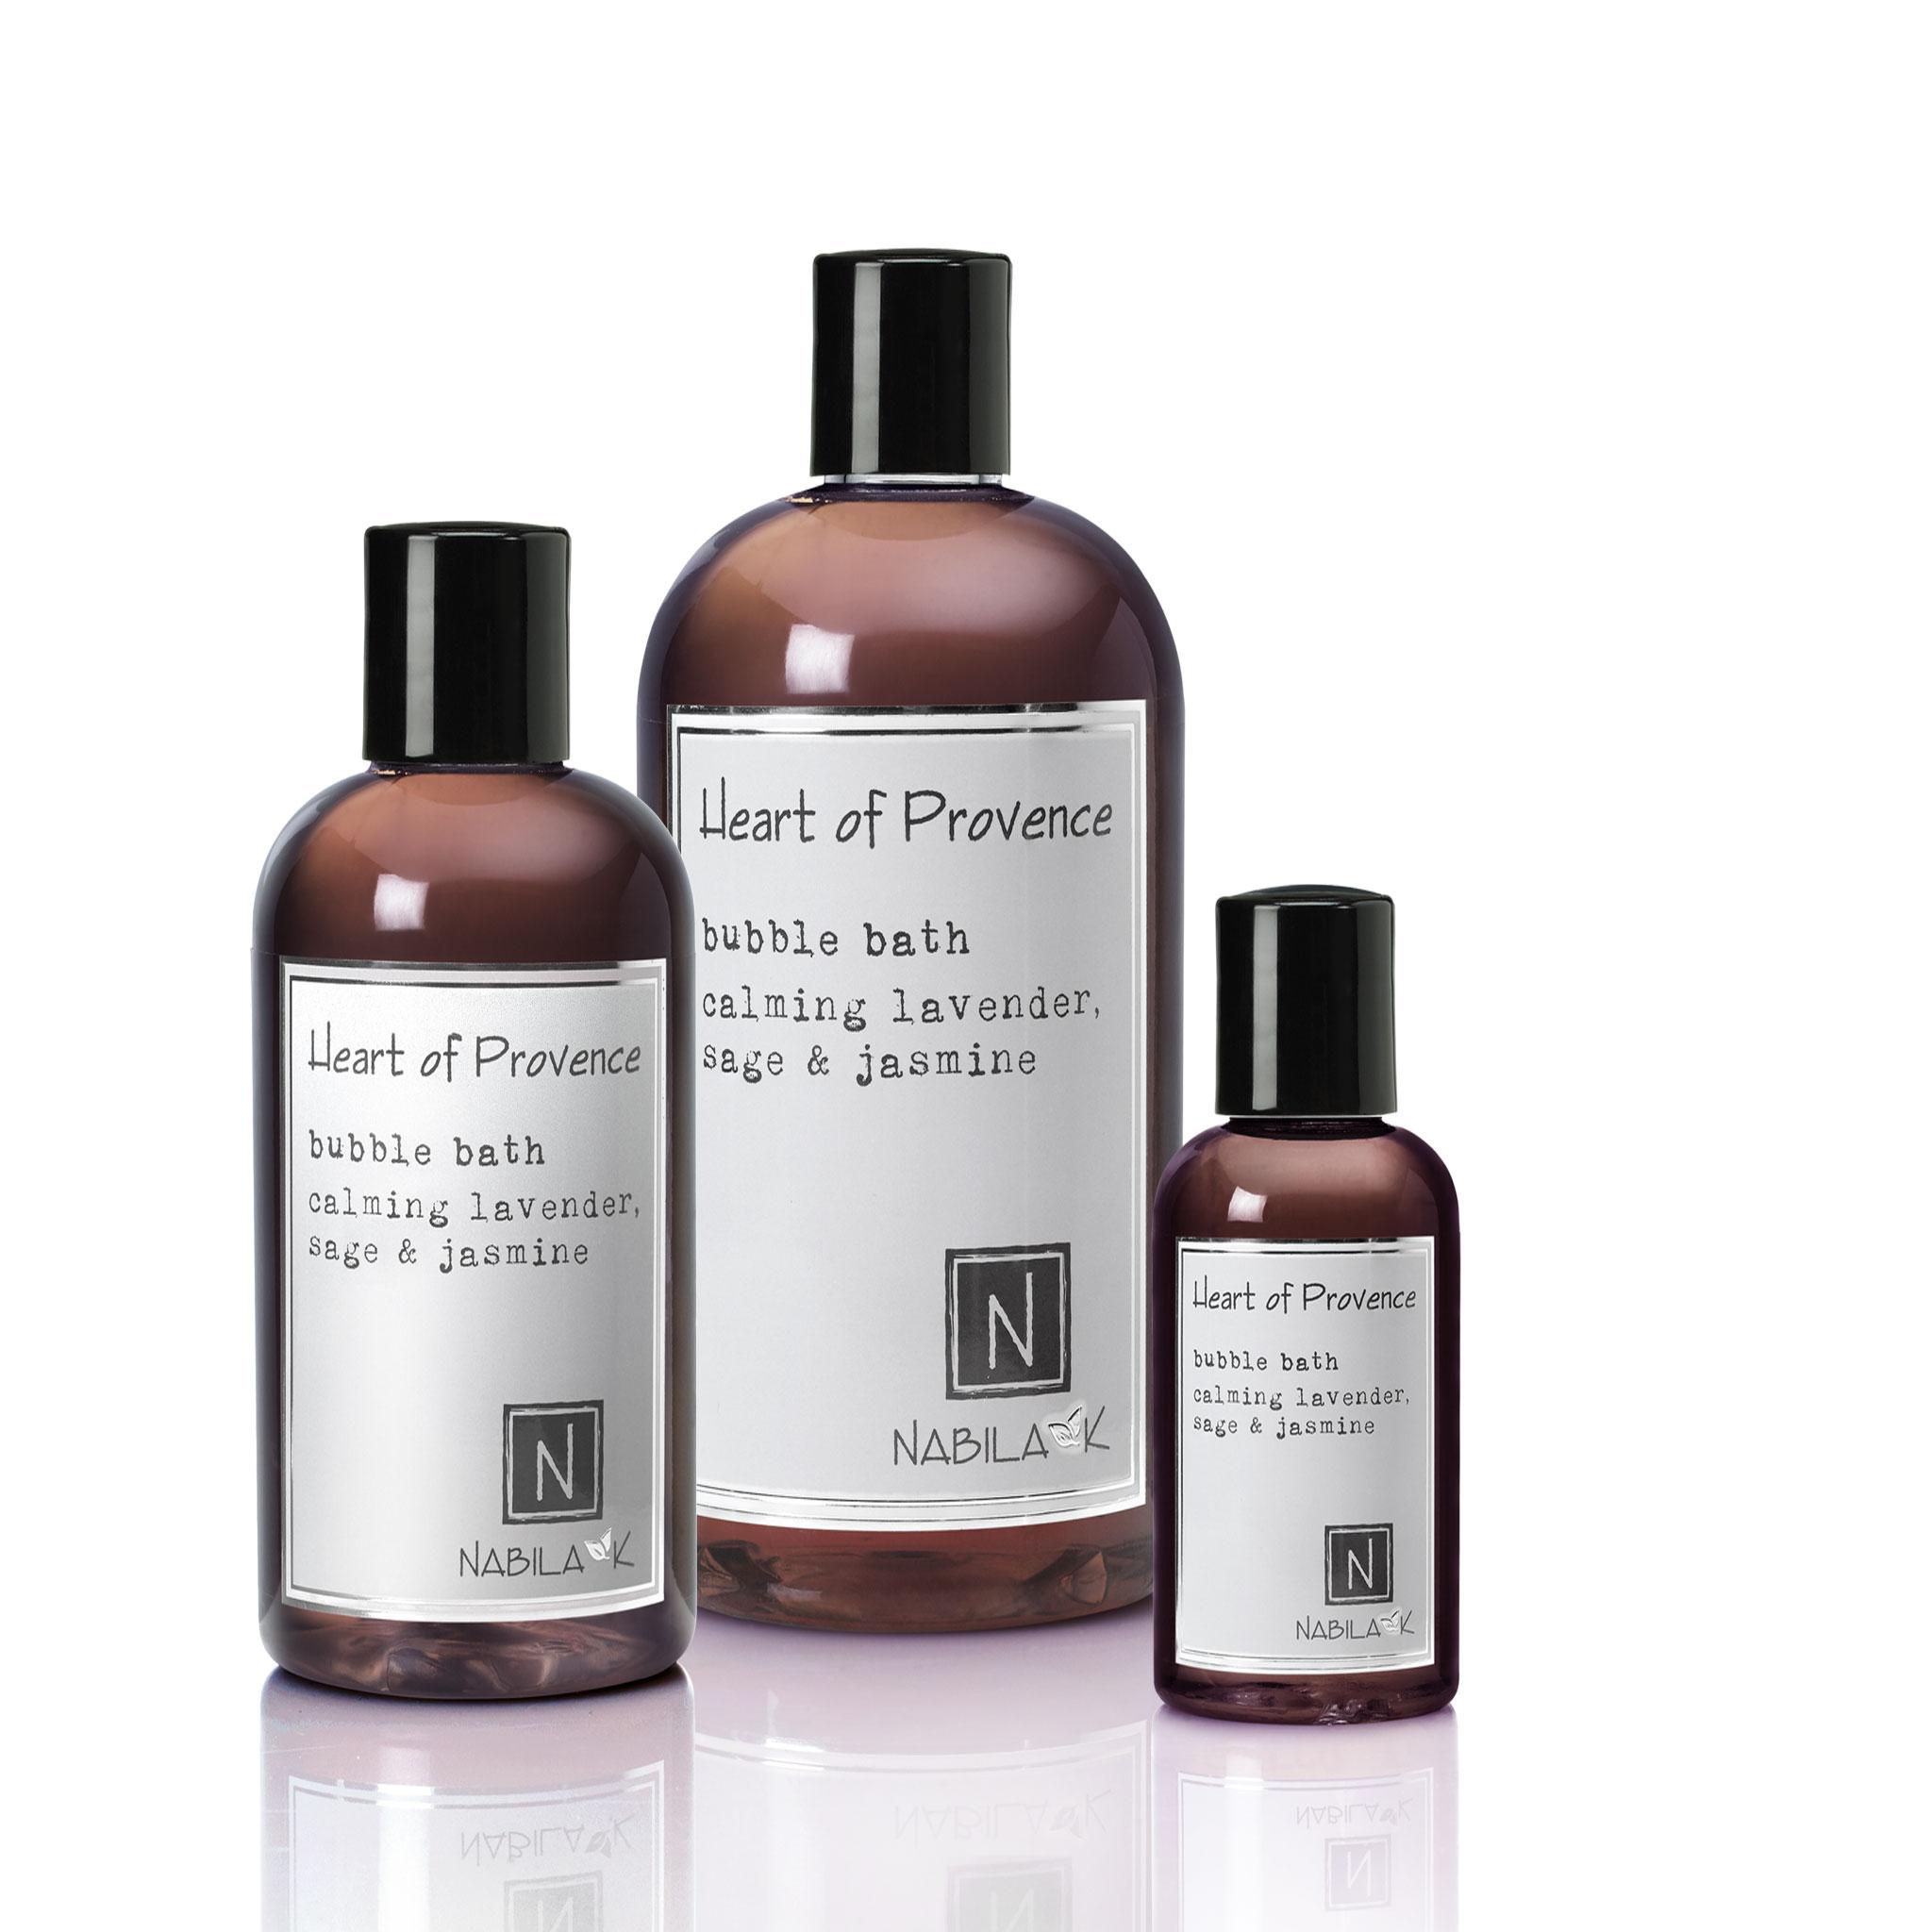 1 2oz bottle and 1 8oz bottle and 1 16oz bottle of heart of provence bubble bath calming lavender sage and jasmine